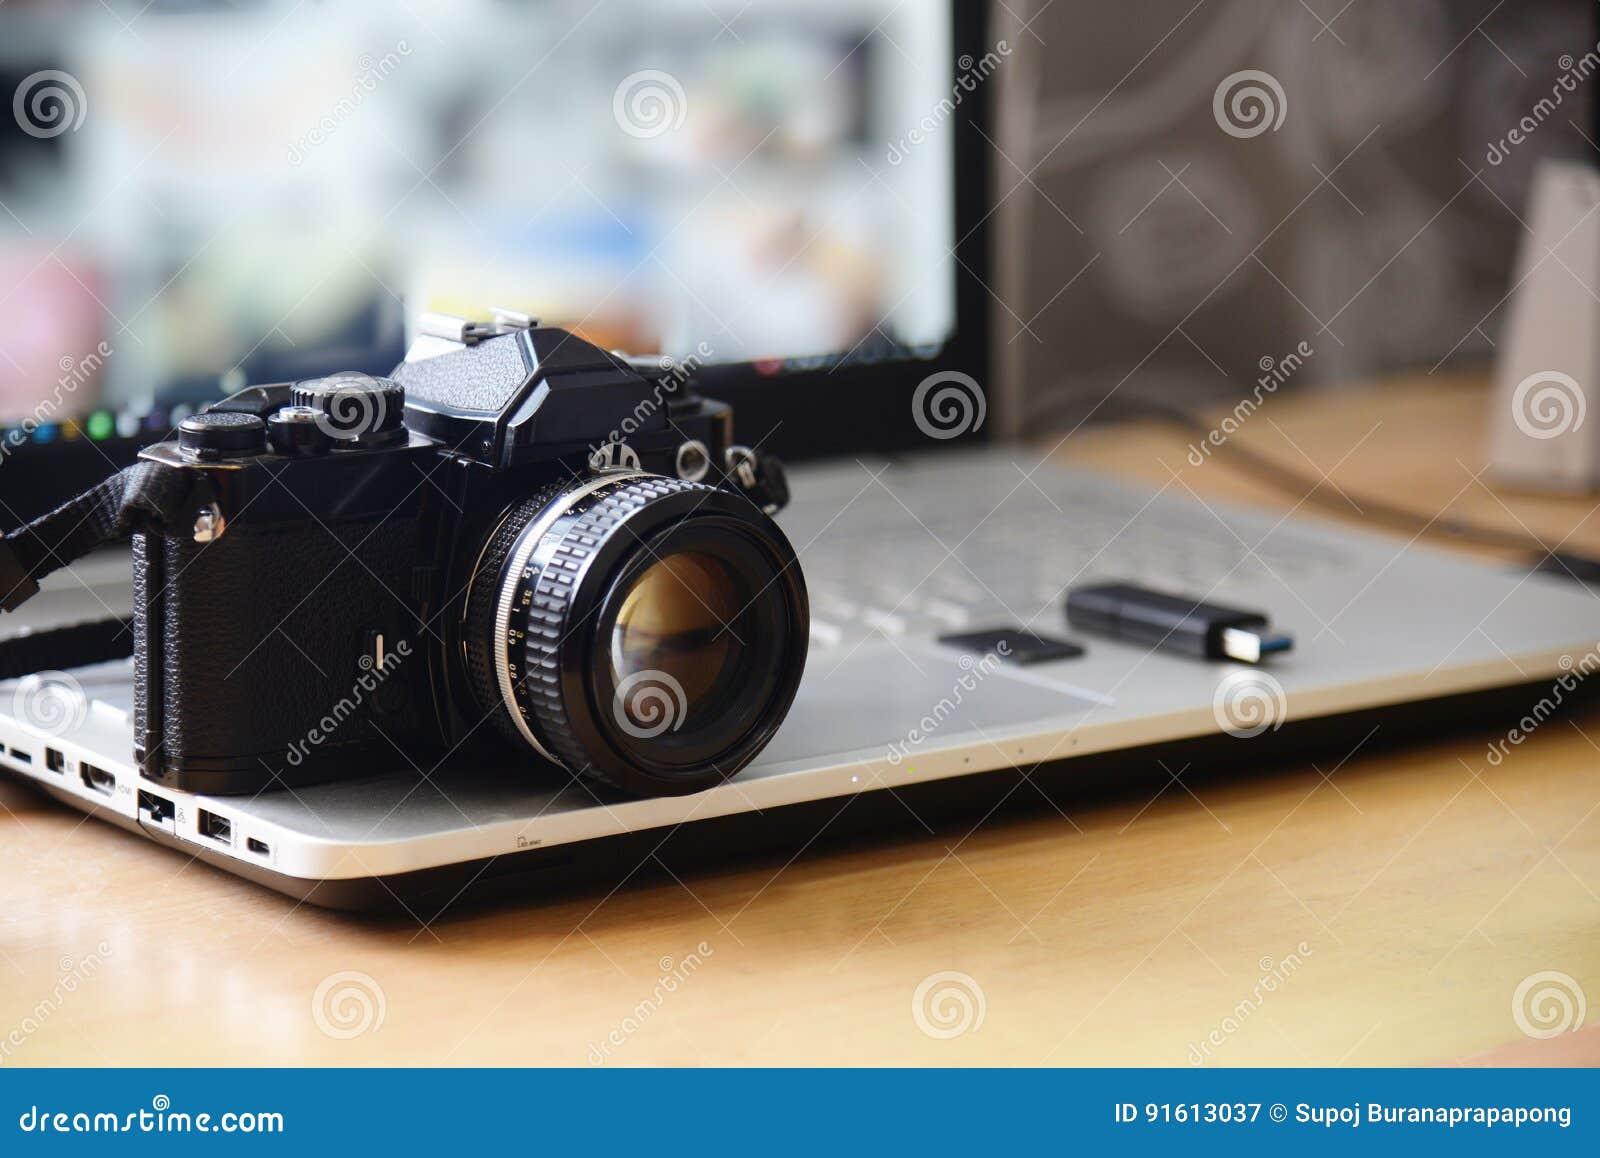 Digital Studio Photography Workstation. Retro film DSLR Camera,